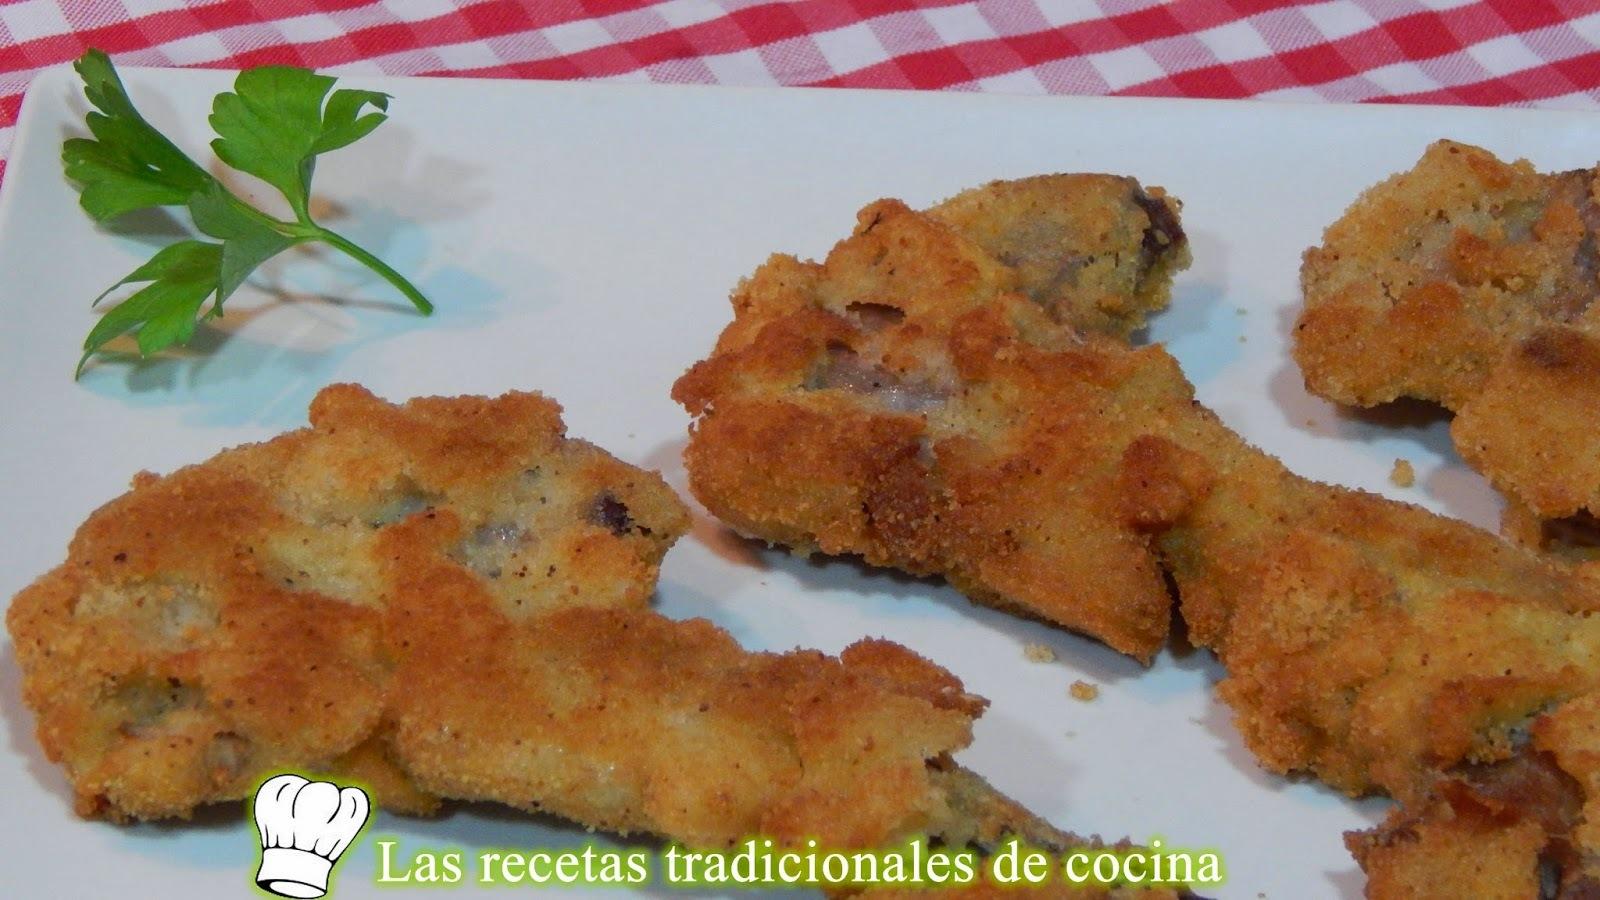 Receta de chuletas de cordero empanadas con bechamel